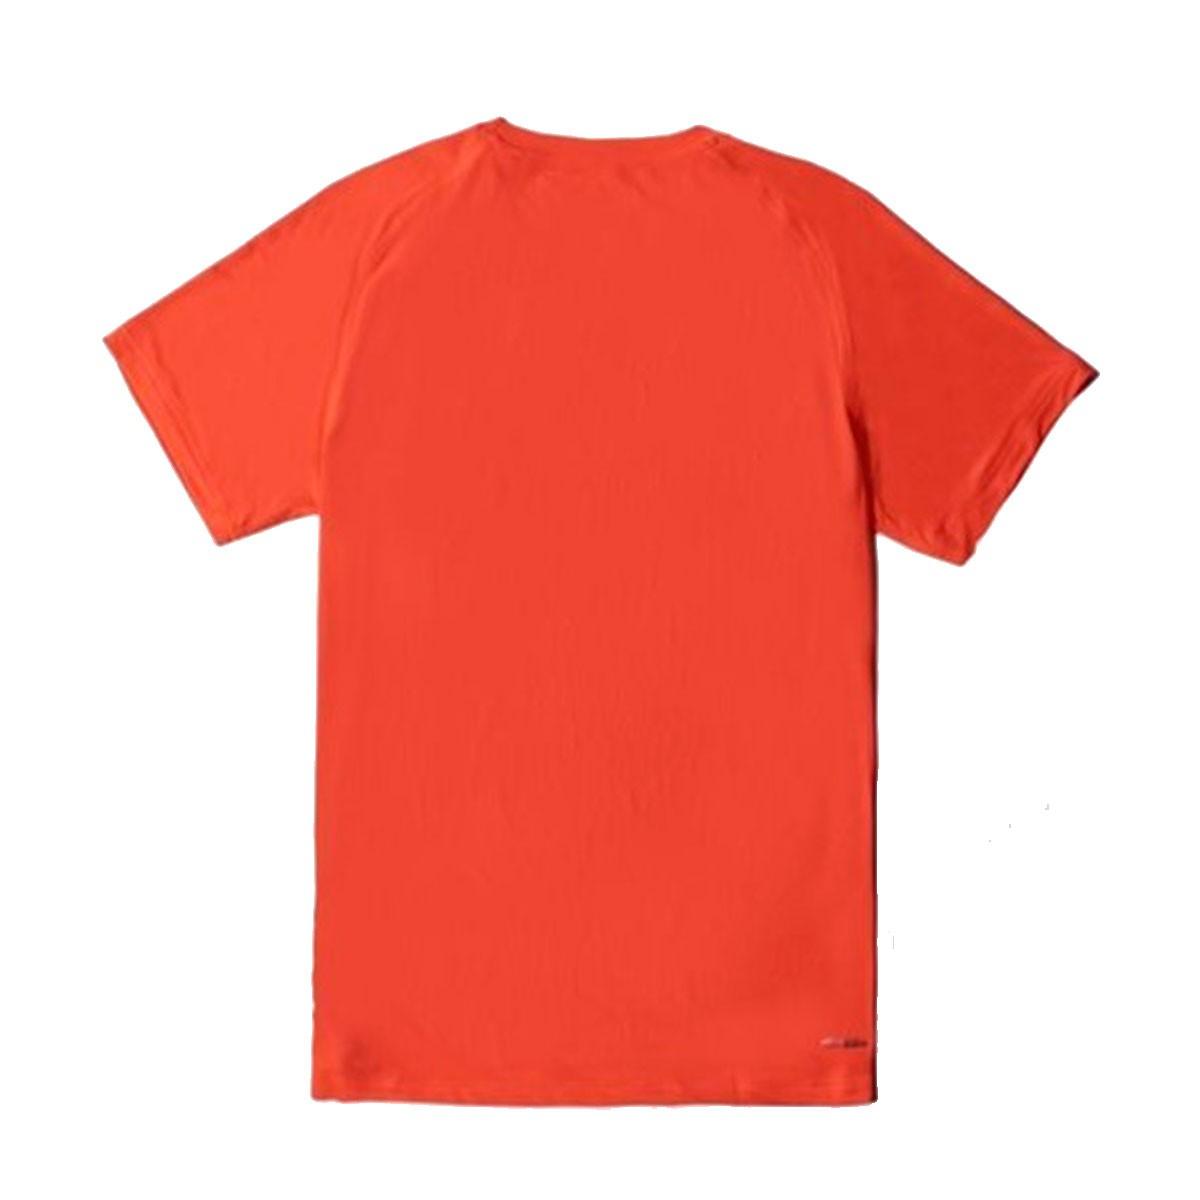 Camiseta Adidas Base Masculino Laranja